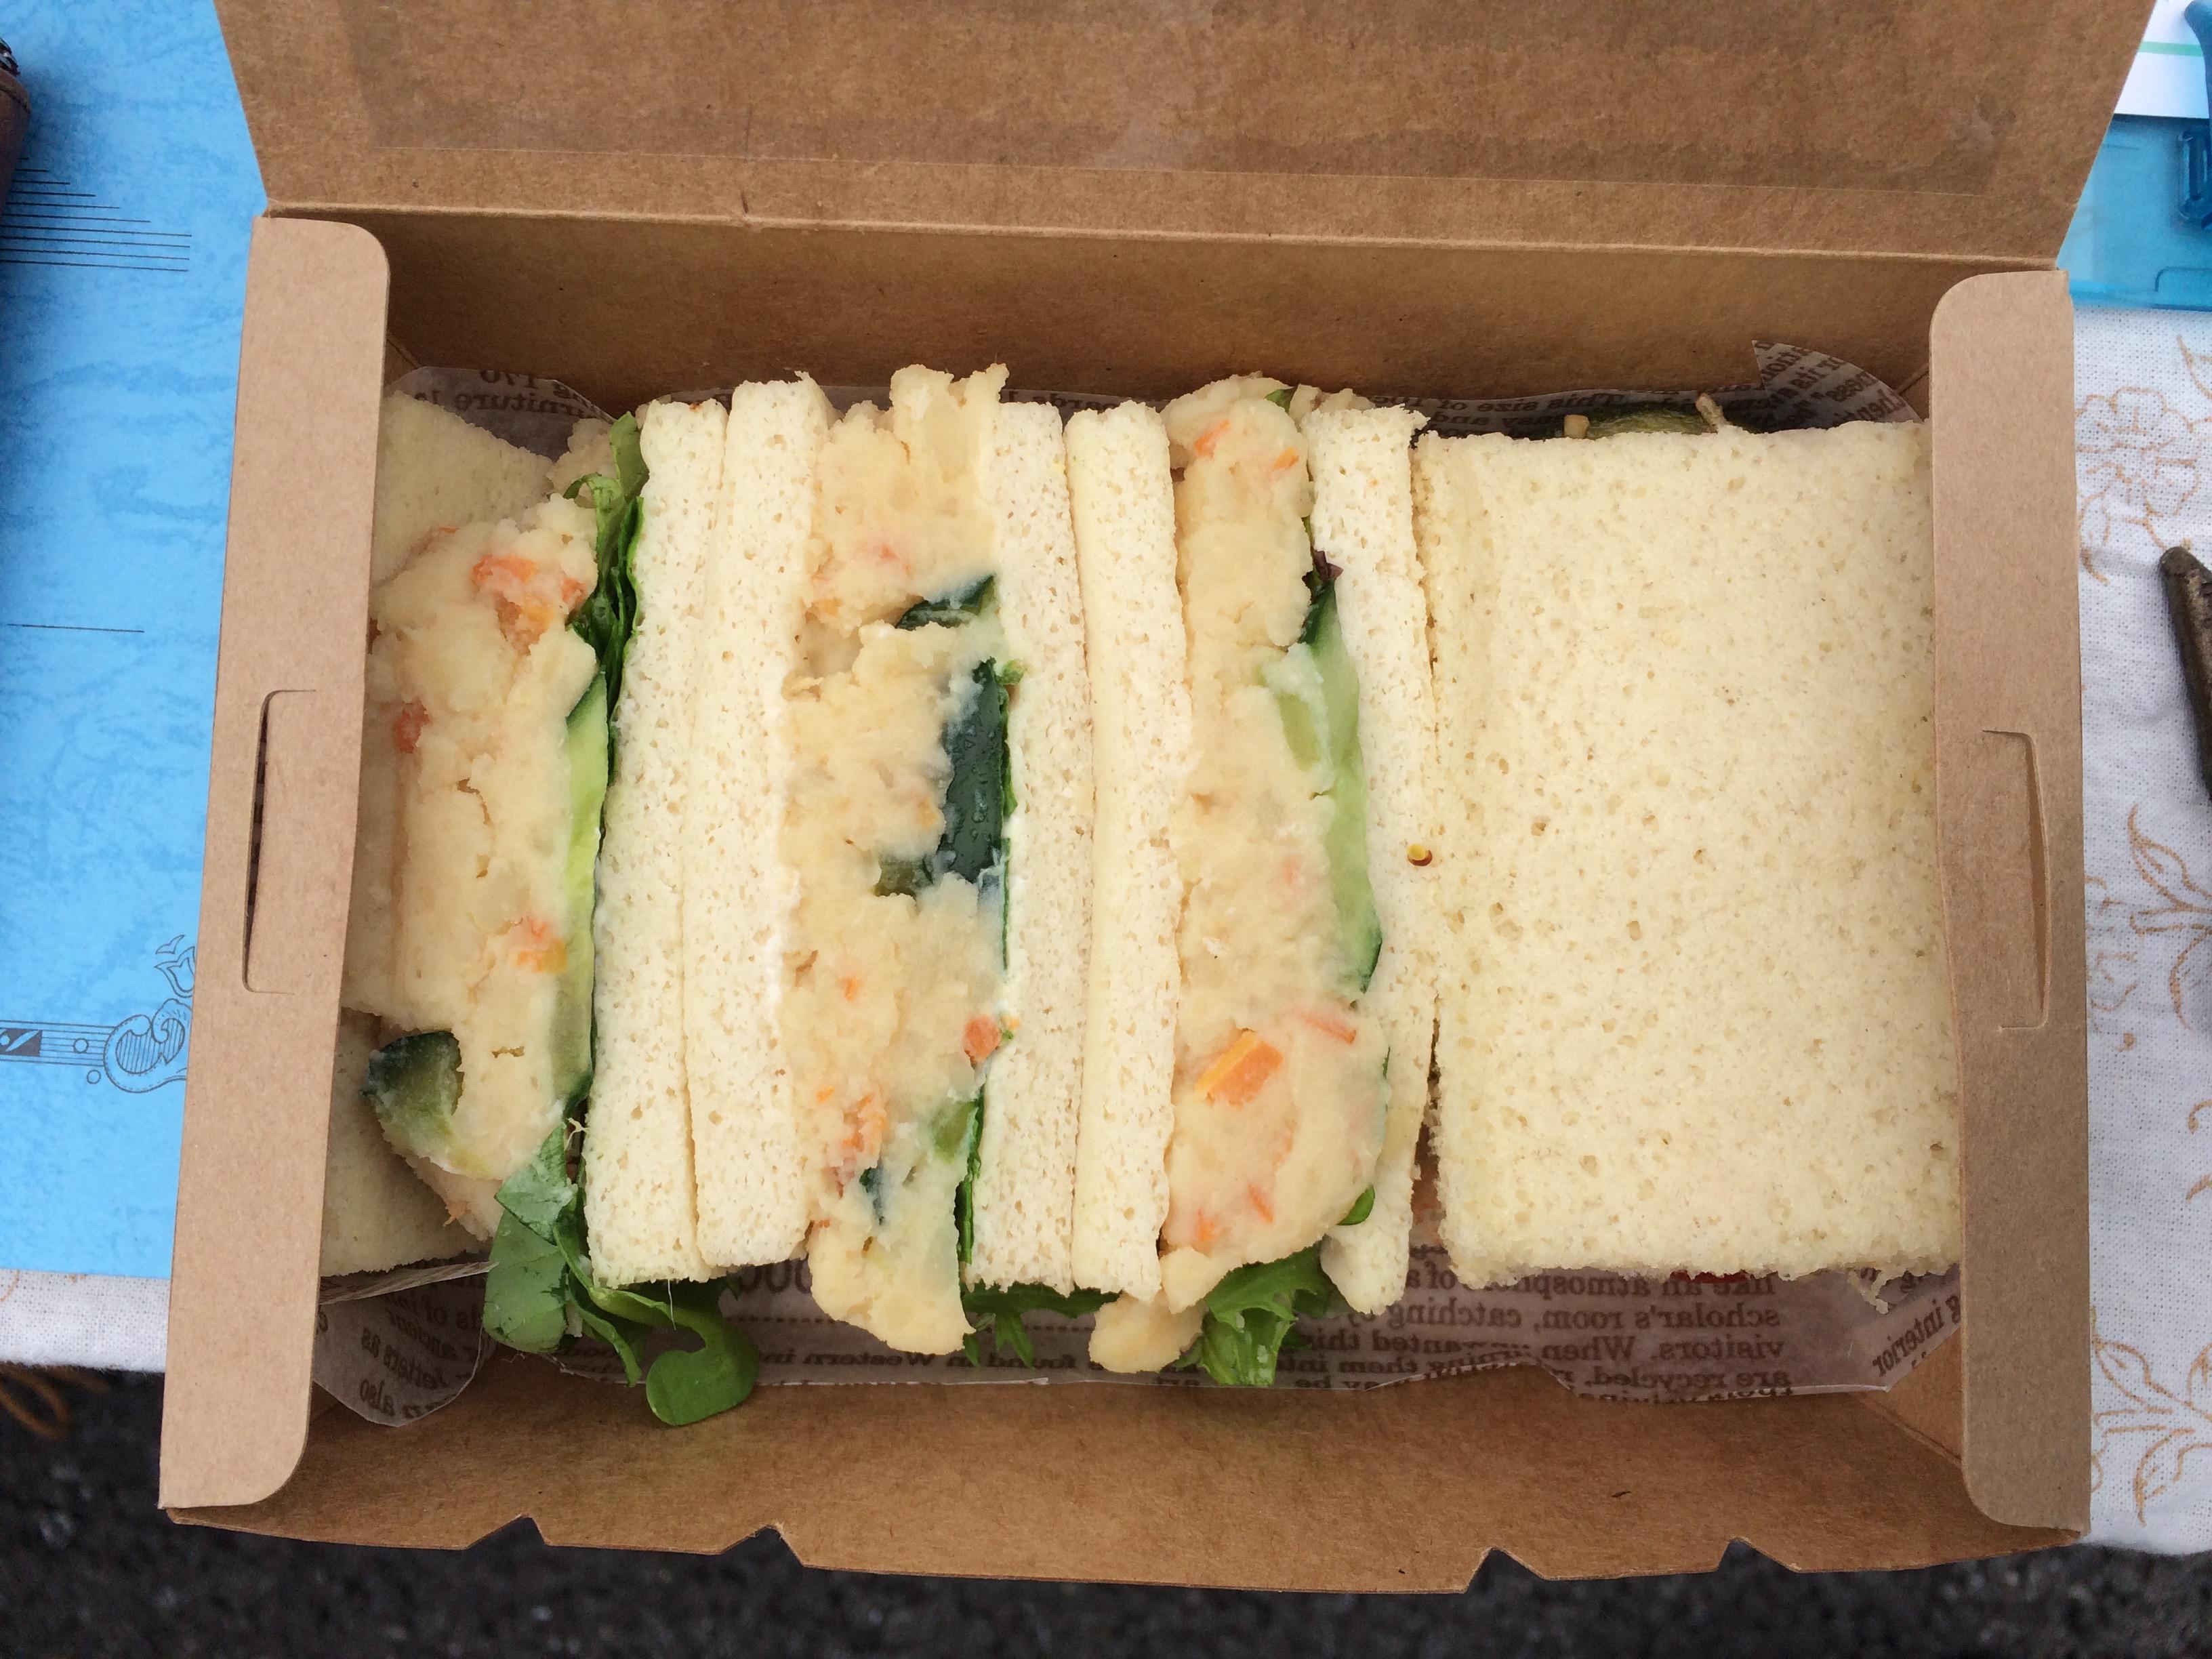 Osakaローベジ祭り2015summer サンドイッチ